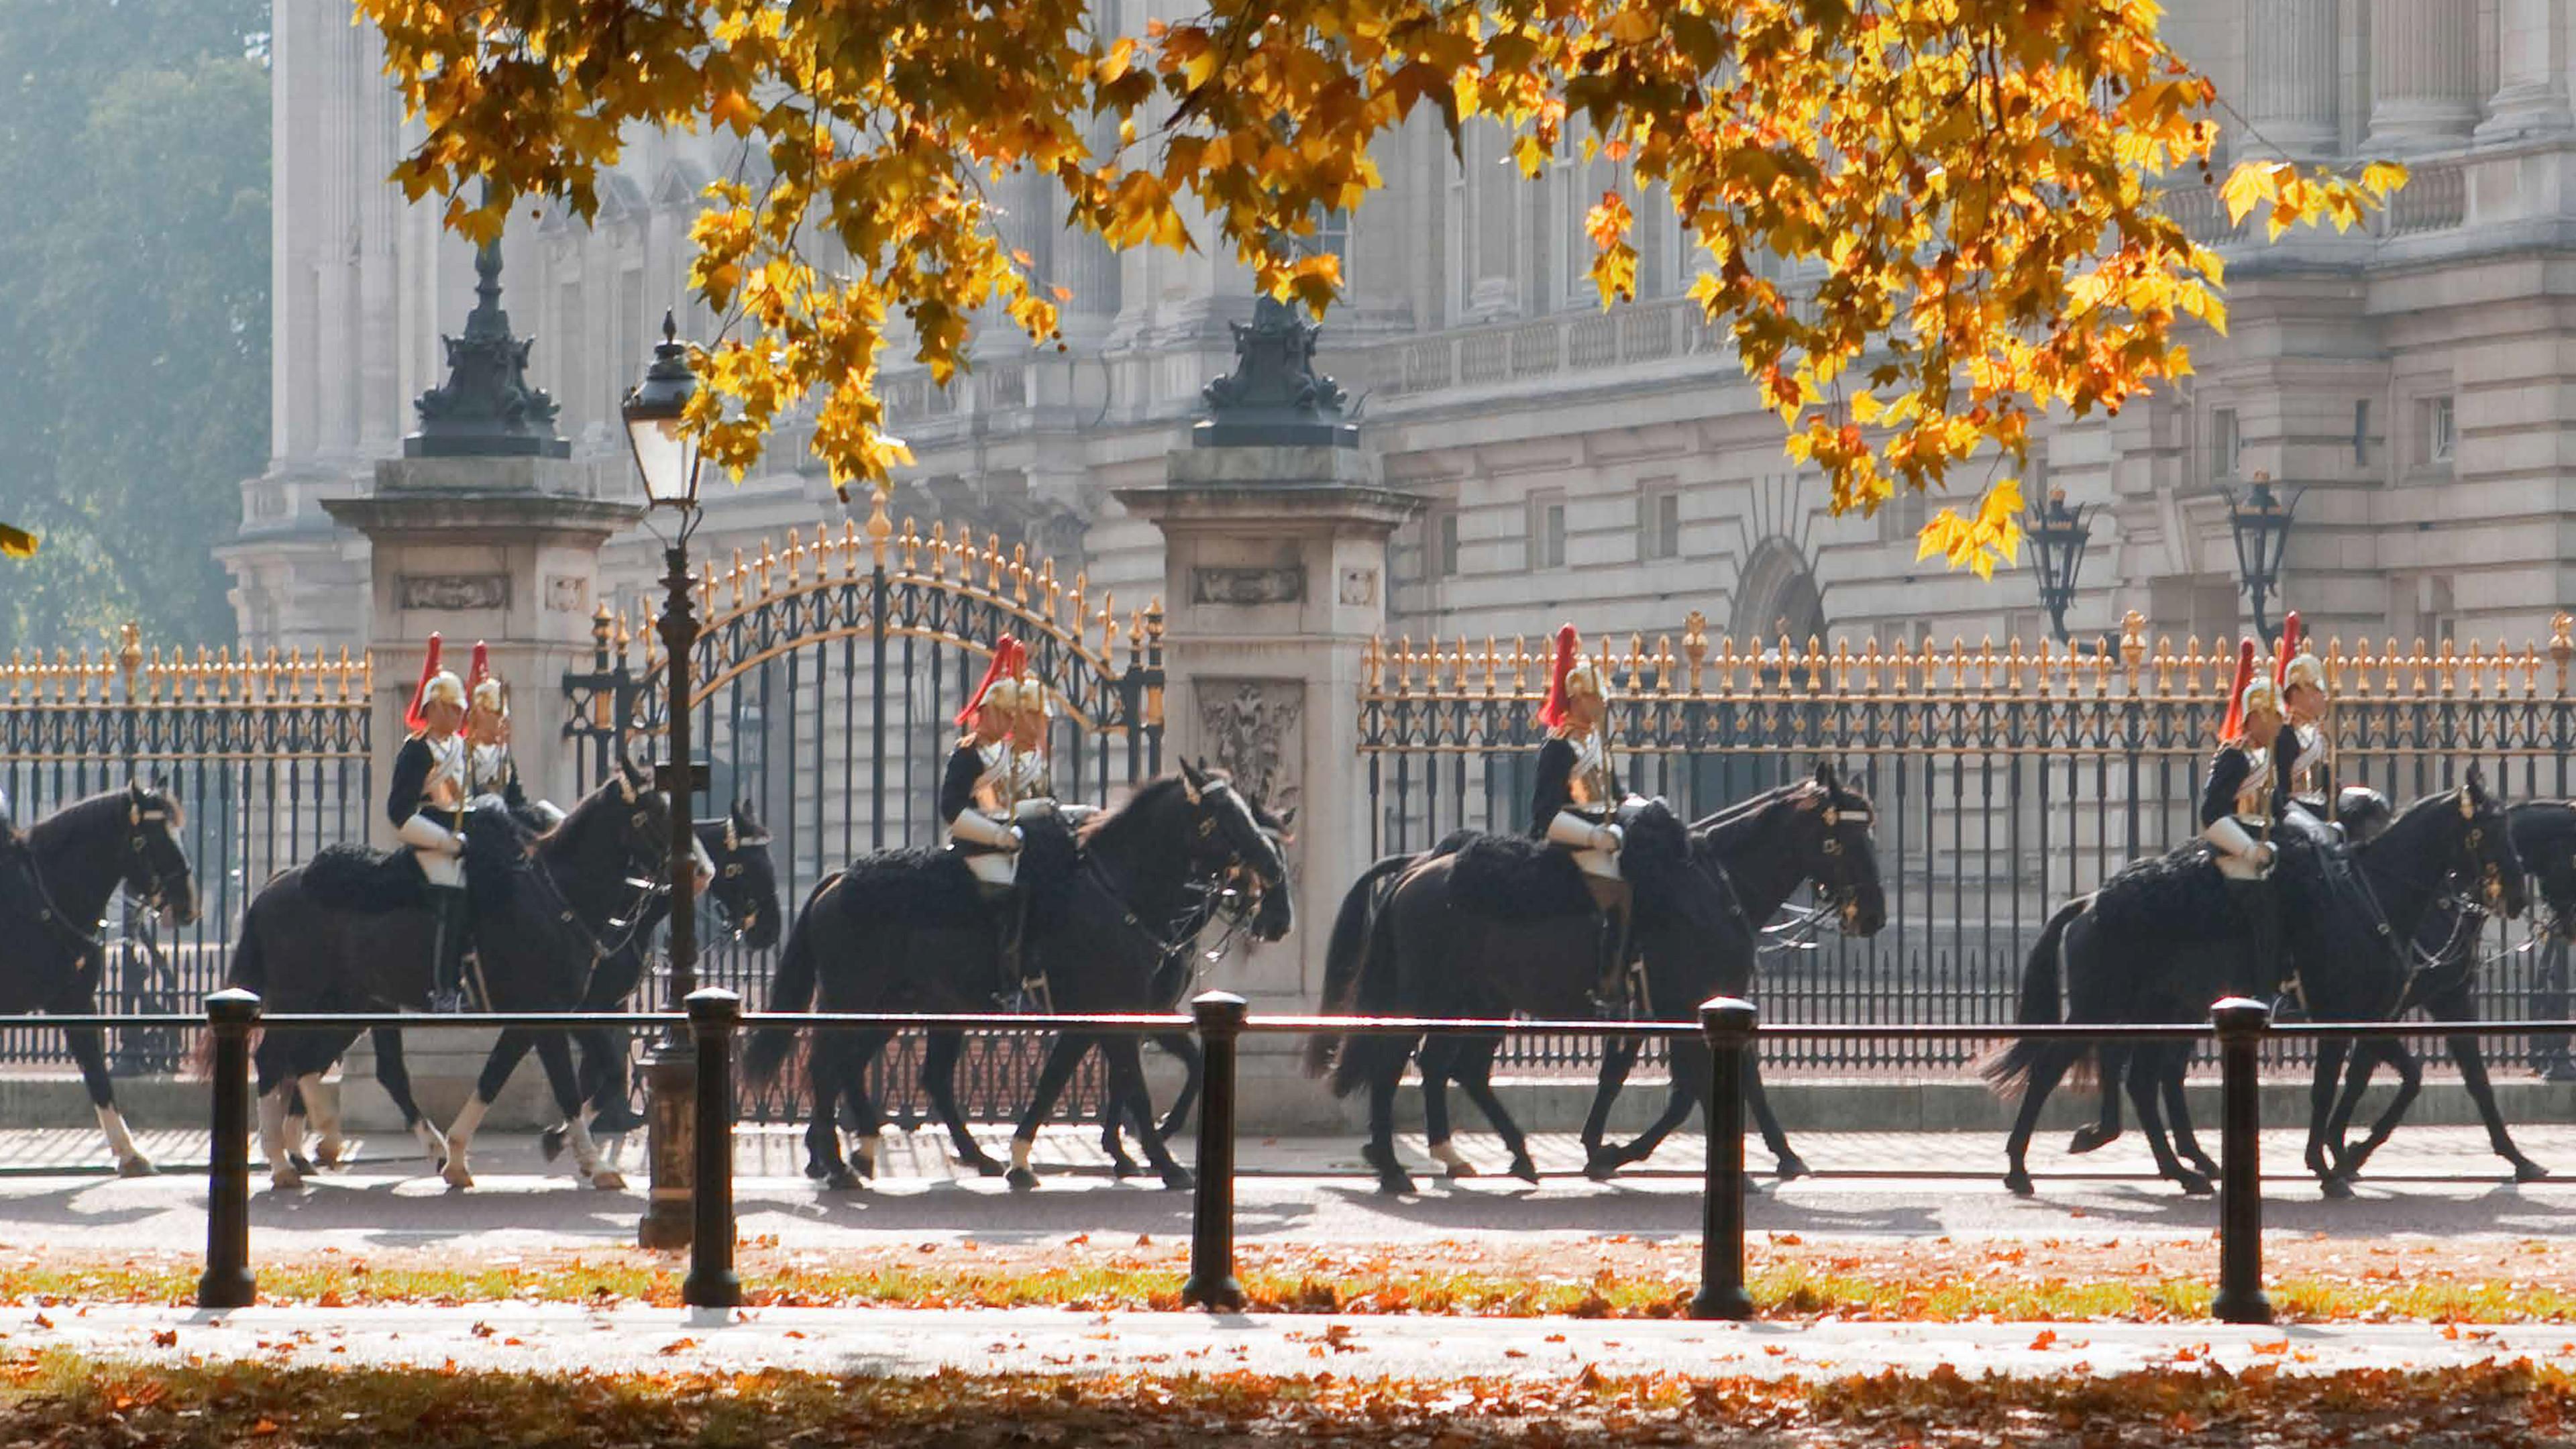 Buckingham Palace Quarter, SW1